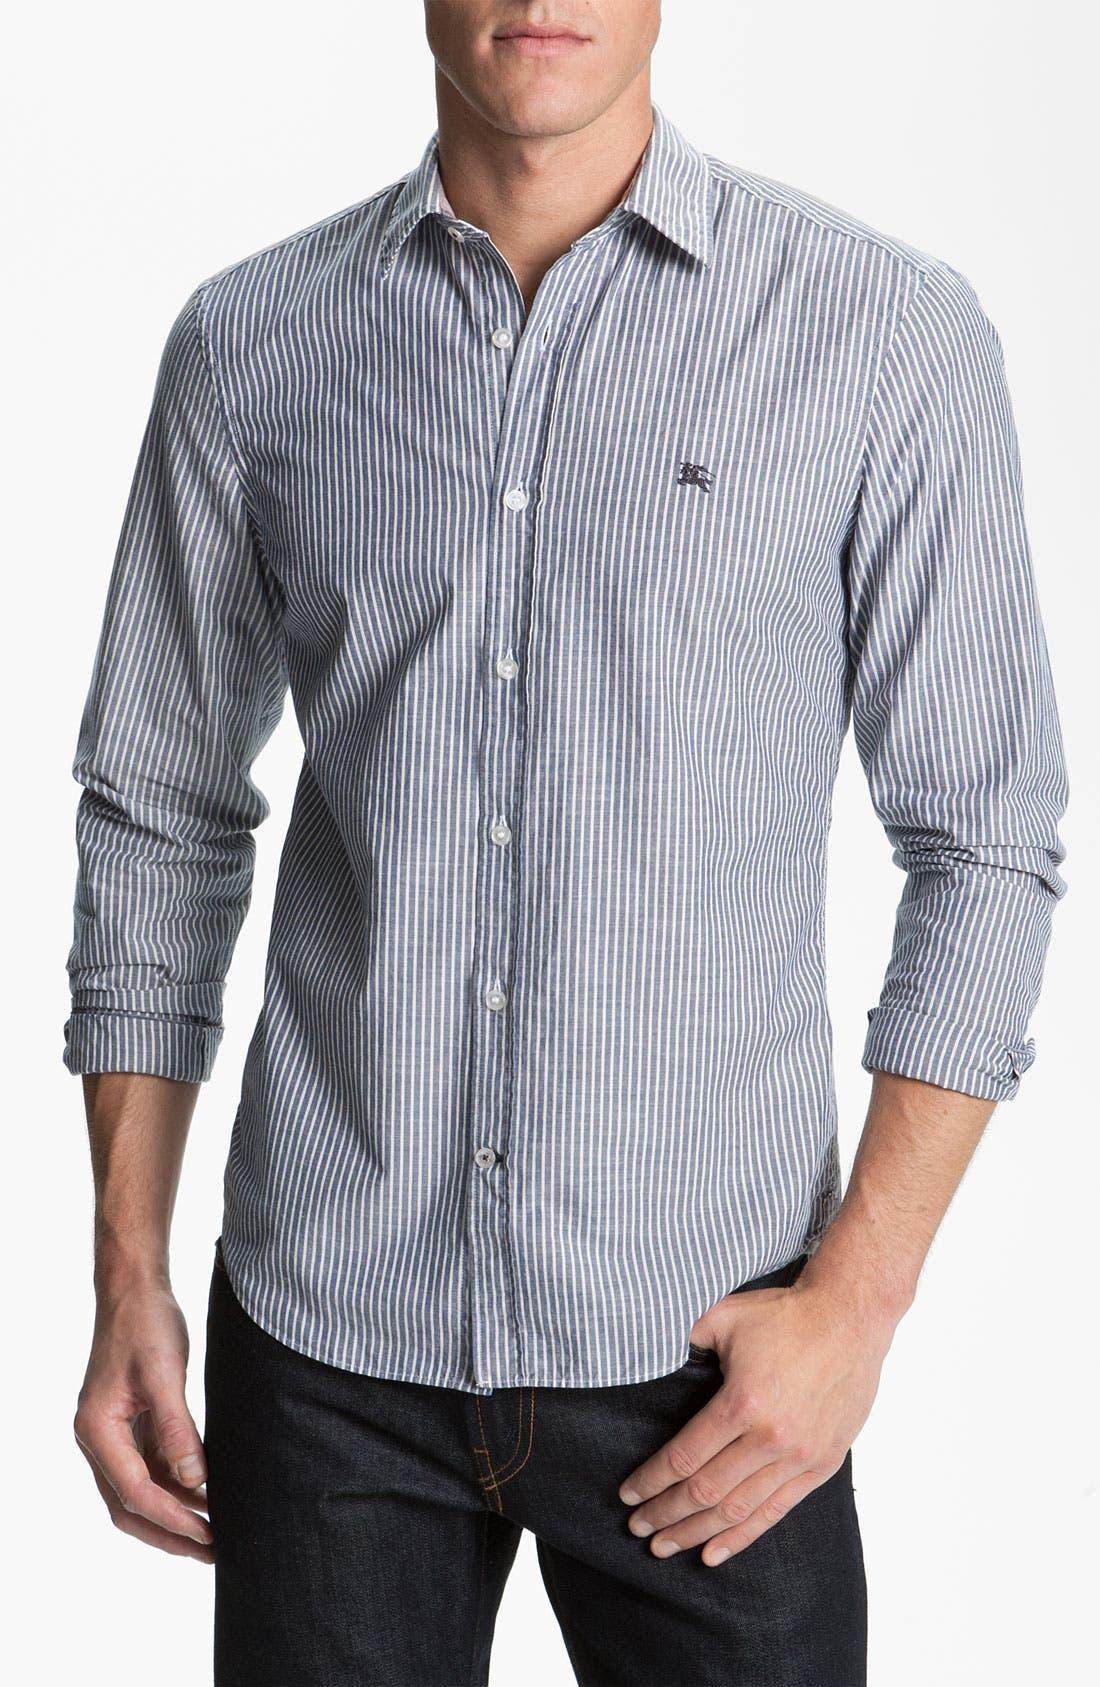 Alternate Image 1 Selected - Burberry Brit Stripe Trim Fit Sport Shirt